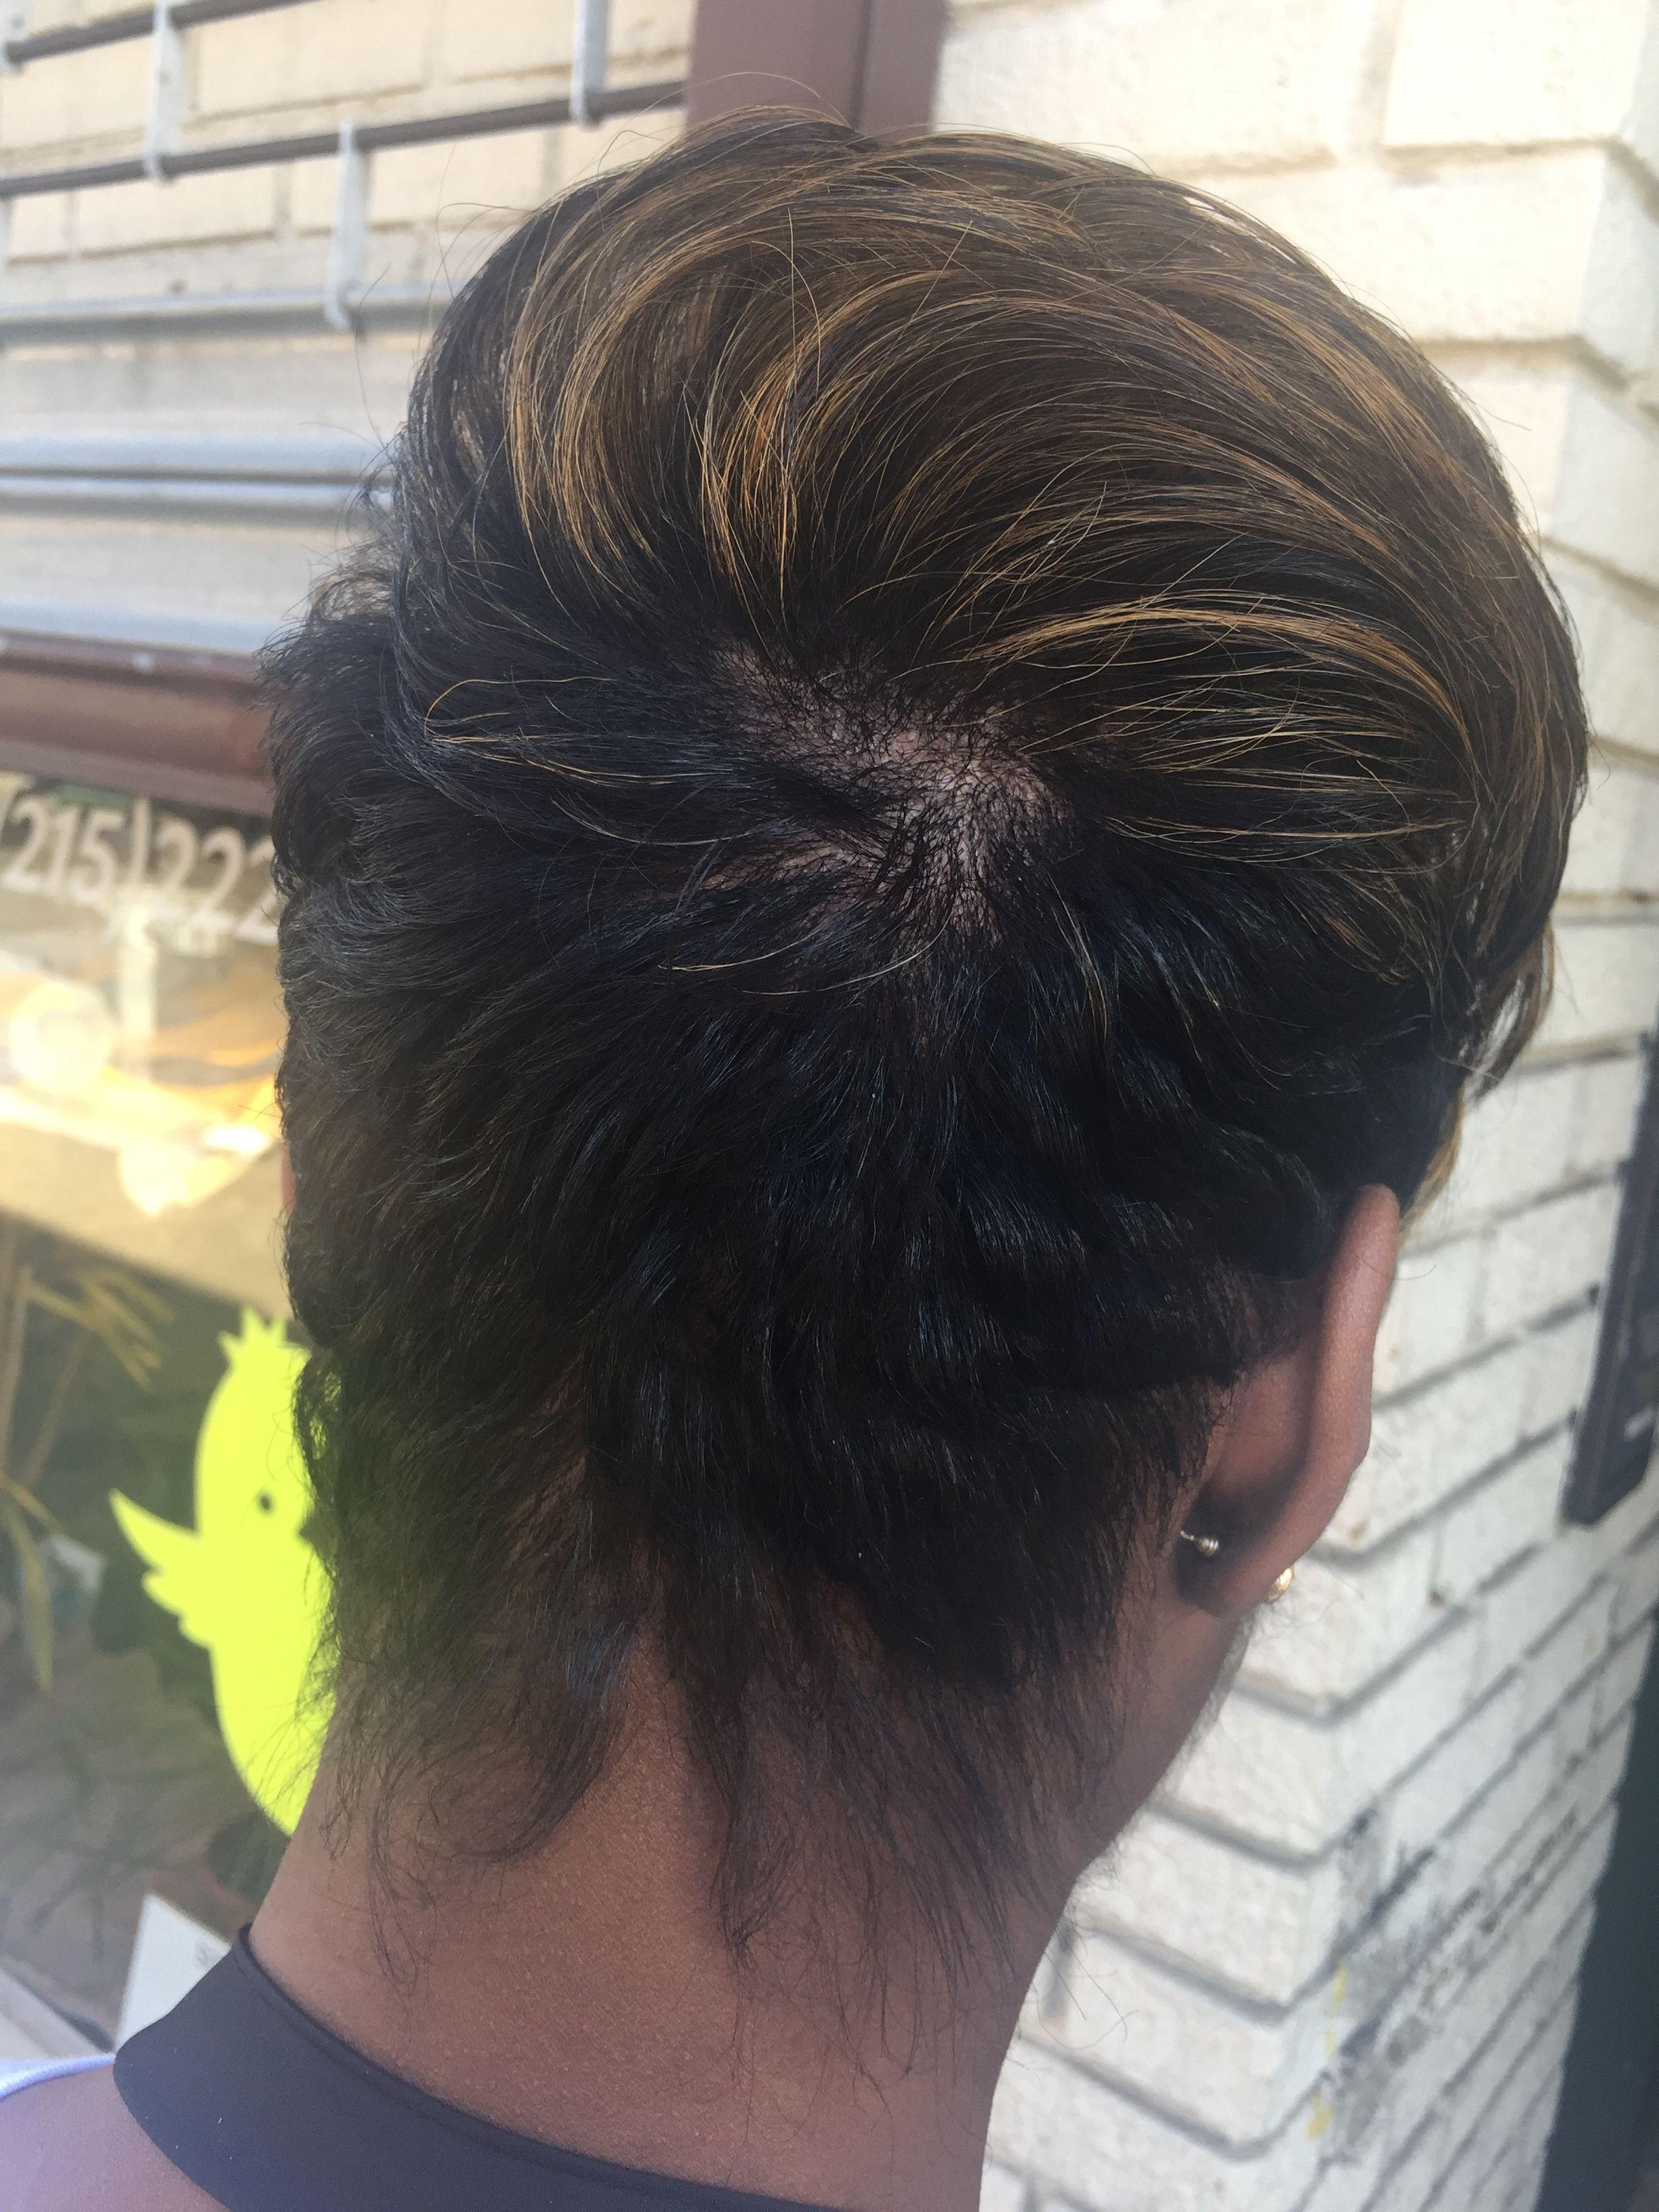 Relaxer Free Hair Le Loft Llc Hair Salon Phila Pa Stylist Marty Natural Hair Styles Hair Styles Free Hair